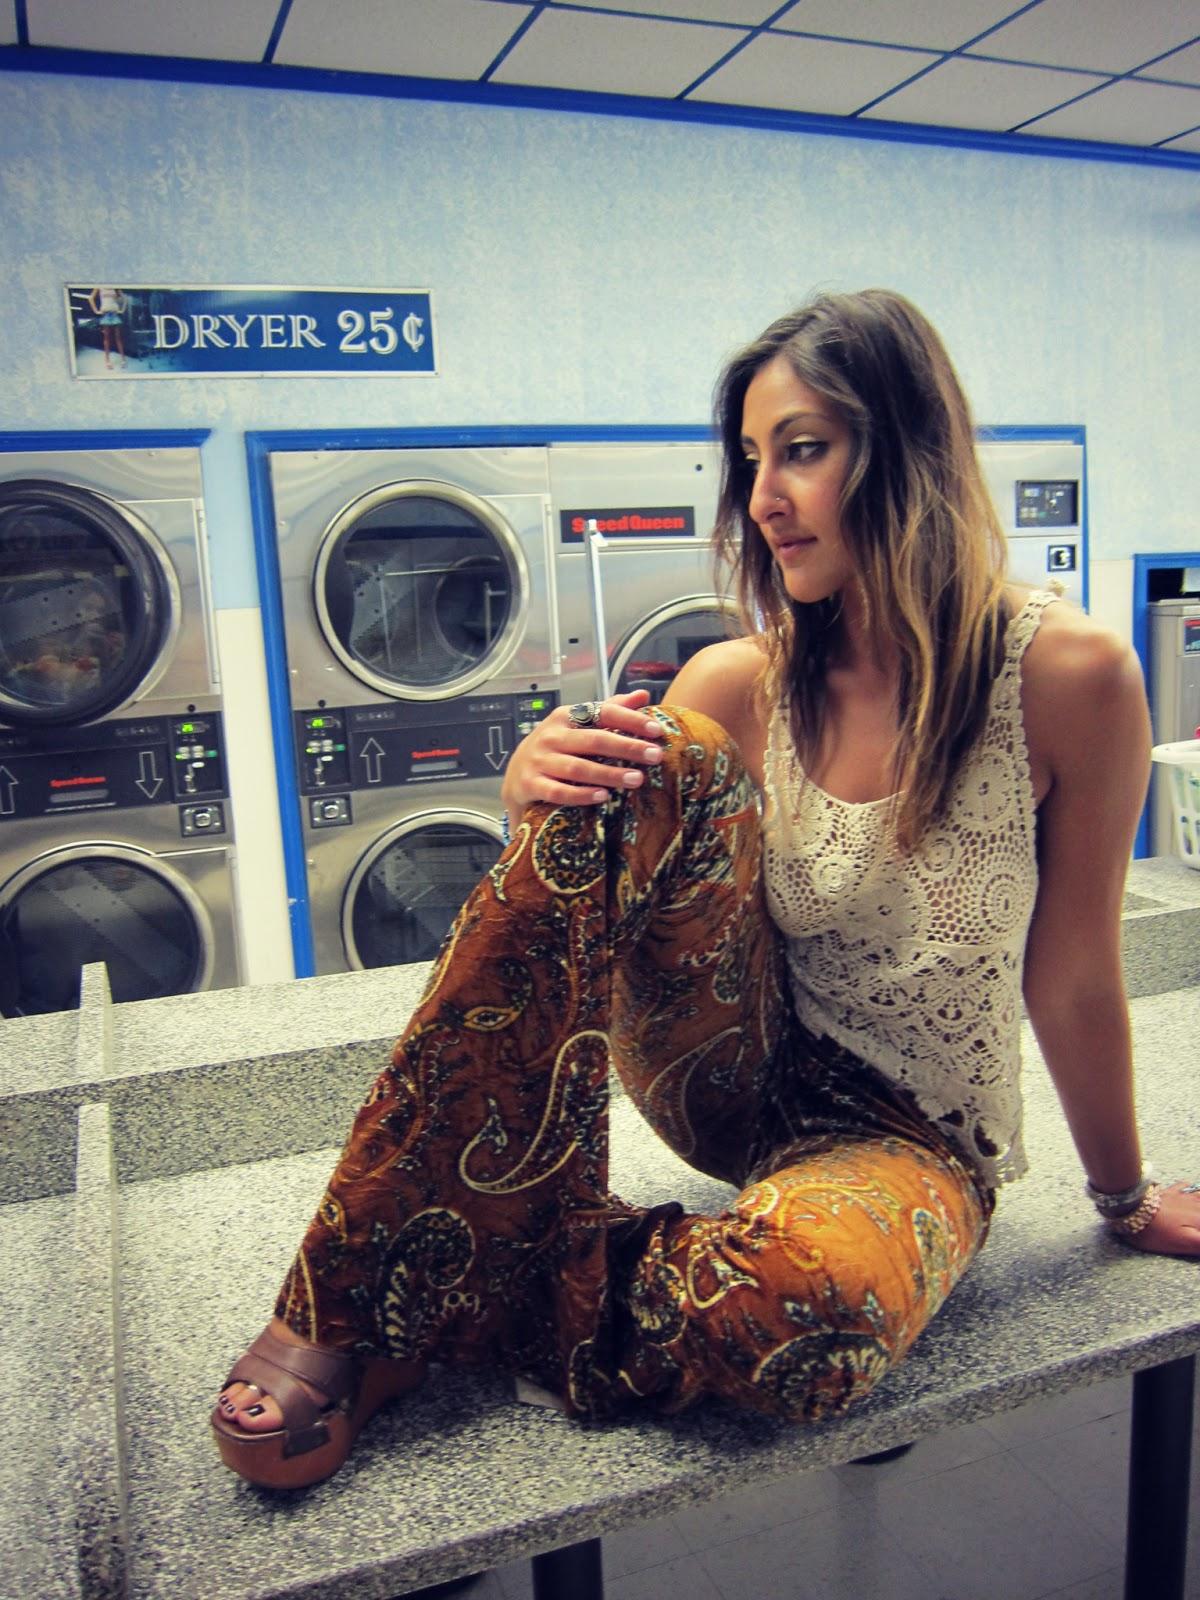 Gypsy Stardust Dirty Laundry